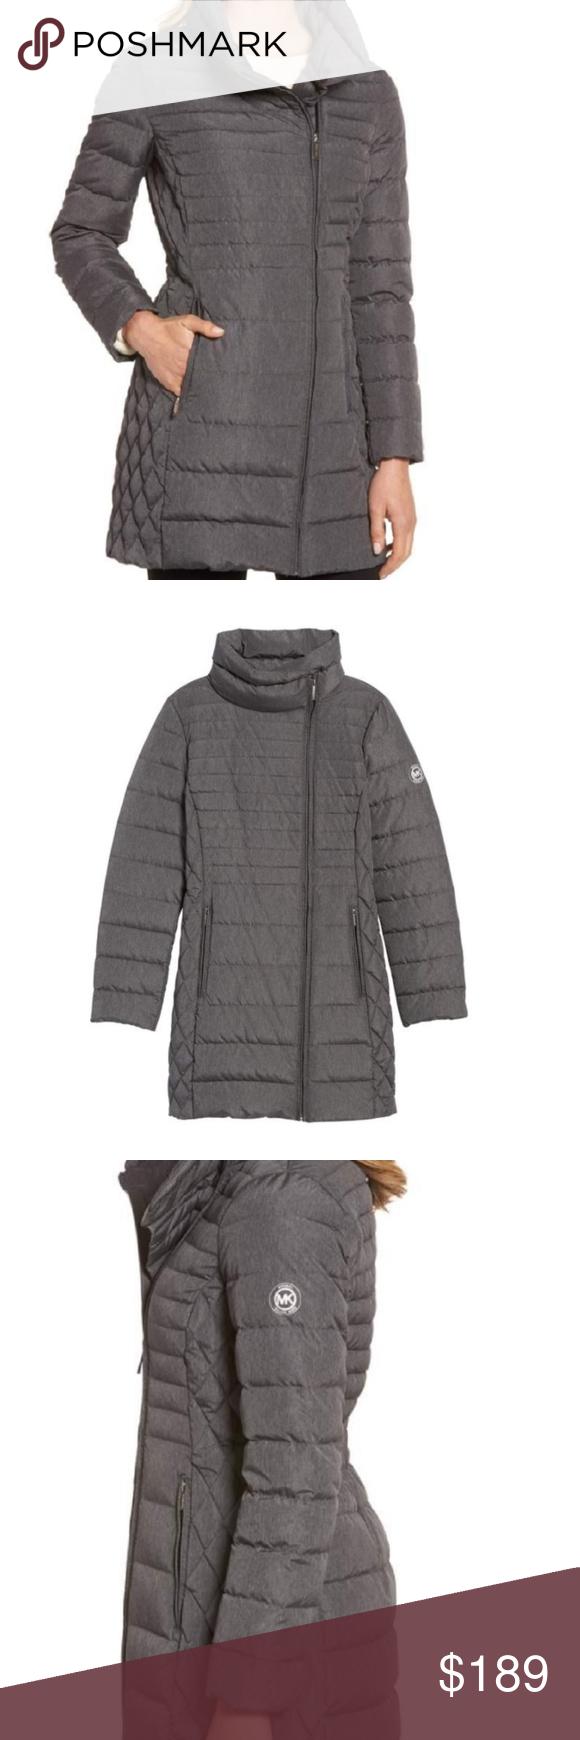 00efa6f33643 Michael Kors Packable Real Down Coat Matt Gray 1X With Matching MK  Drawstring Bag Natural Breathable Down Fill Elastic Back Waist Asymmetrical  Zip Warm